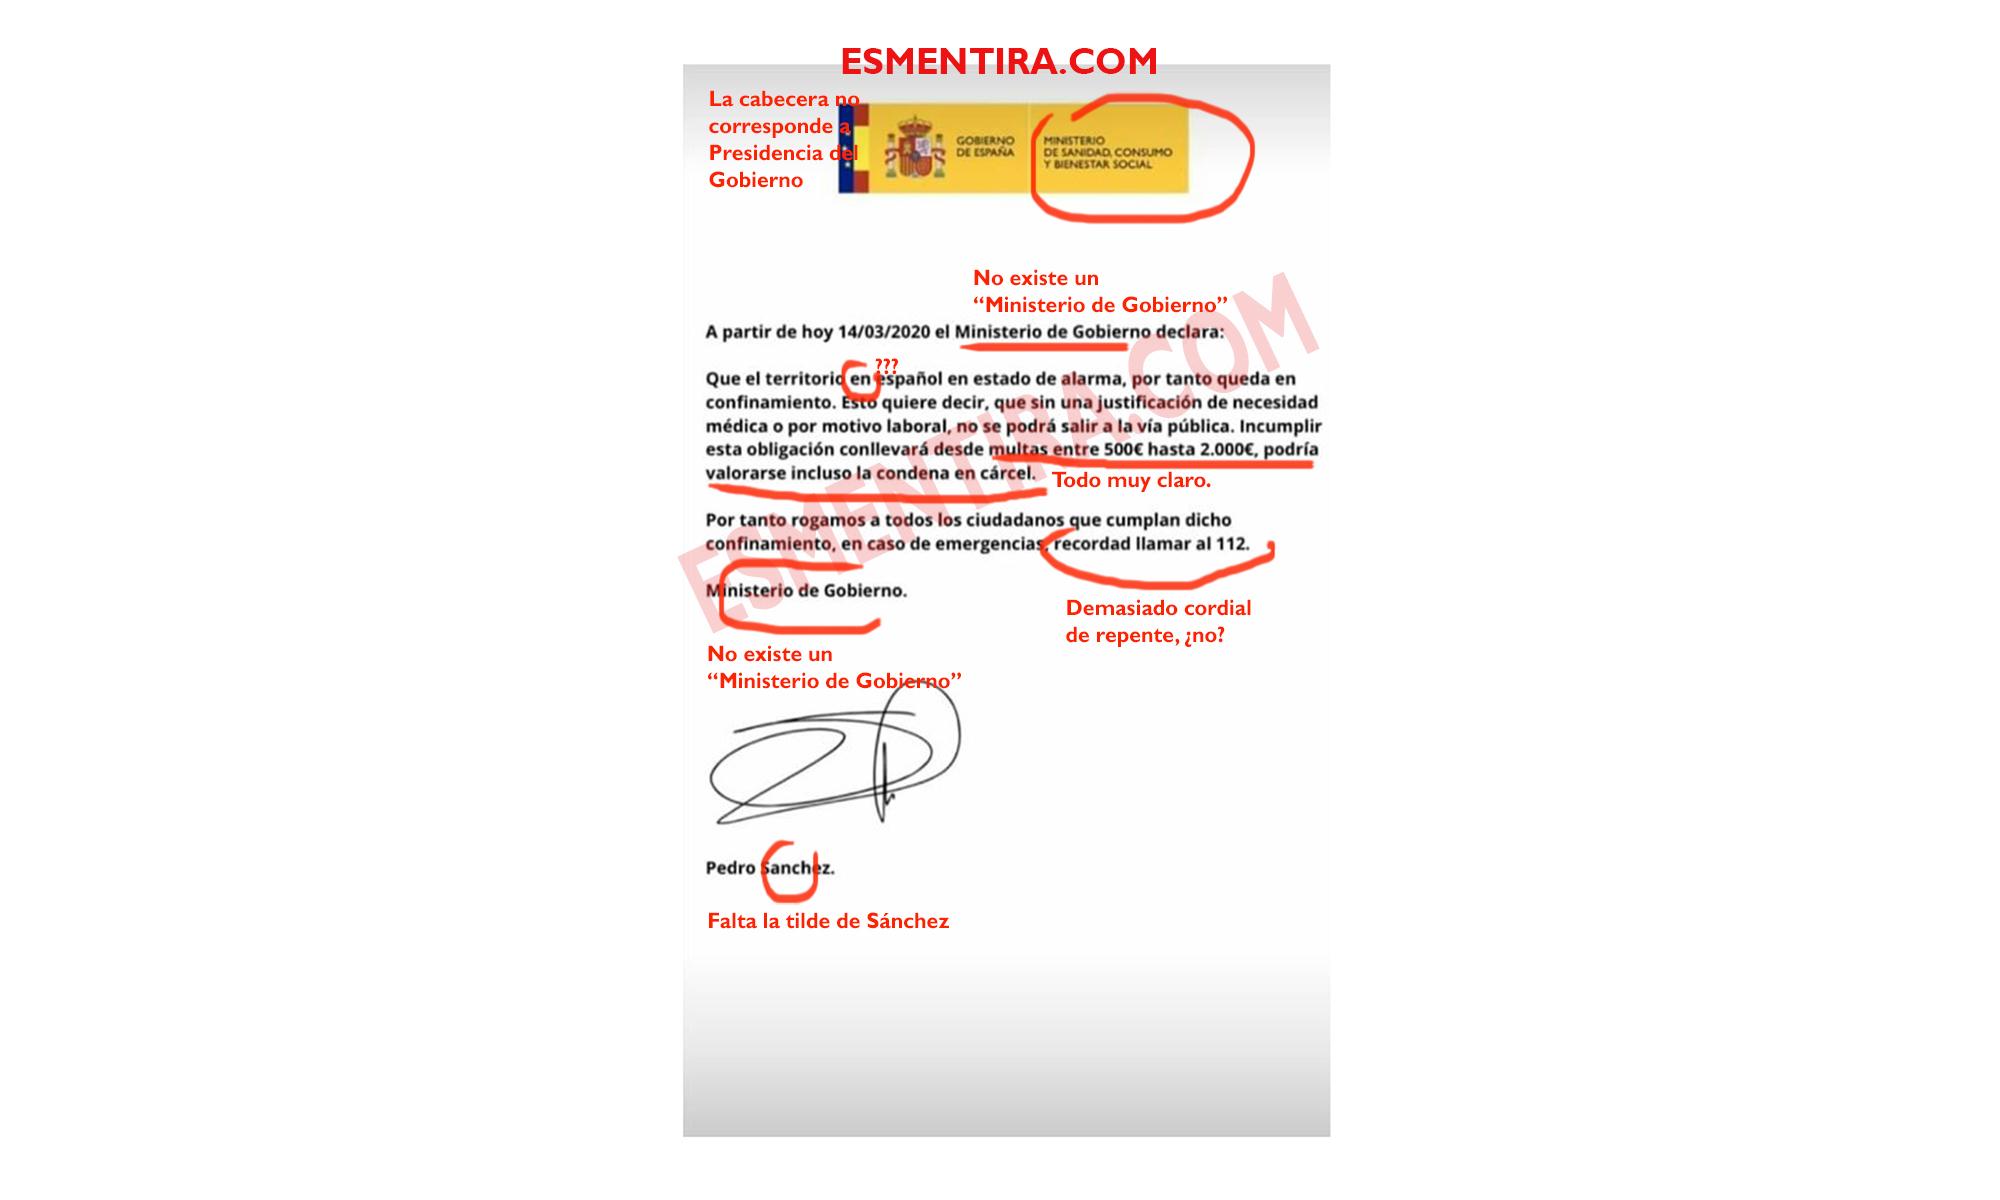 Comunicado falso de presidencia del gobierno cabecera